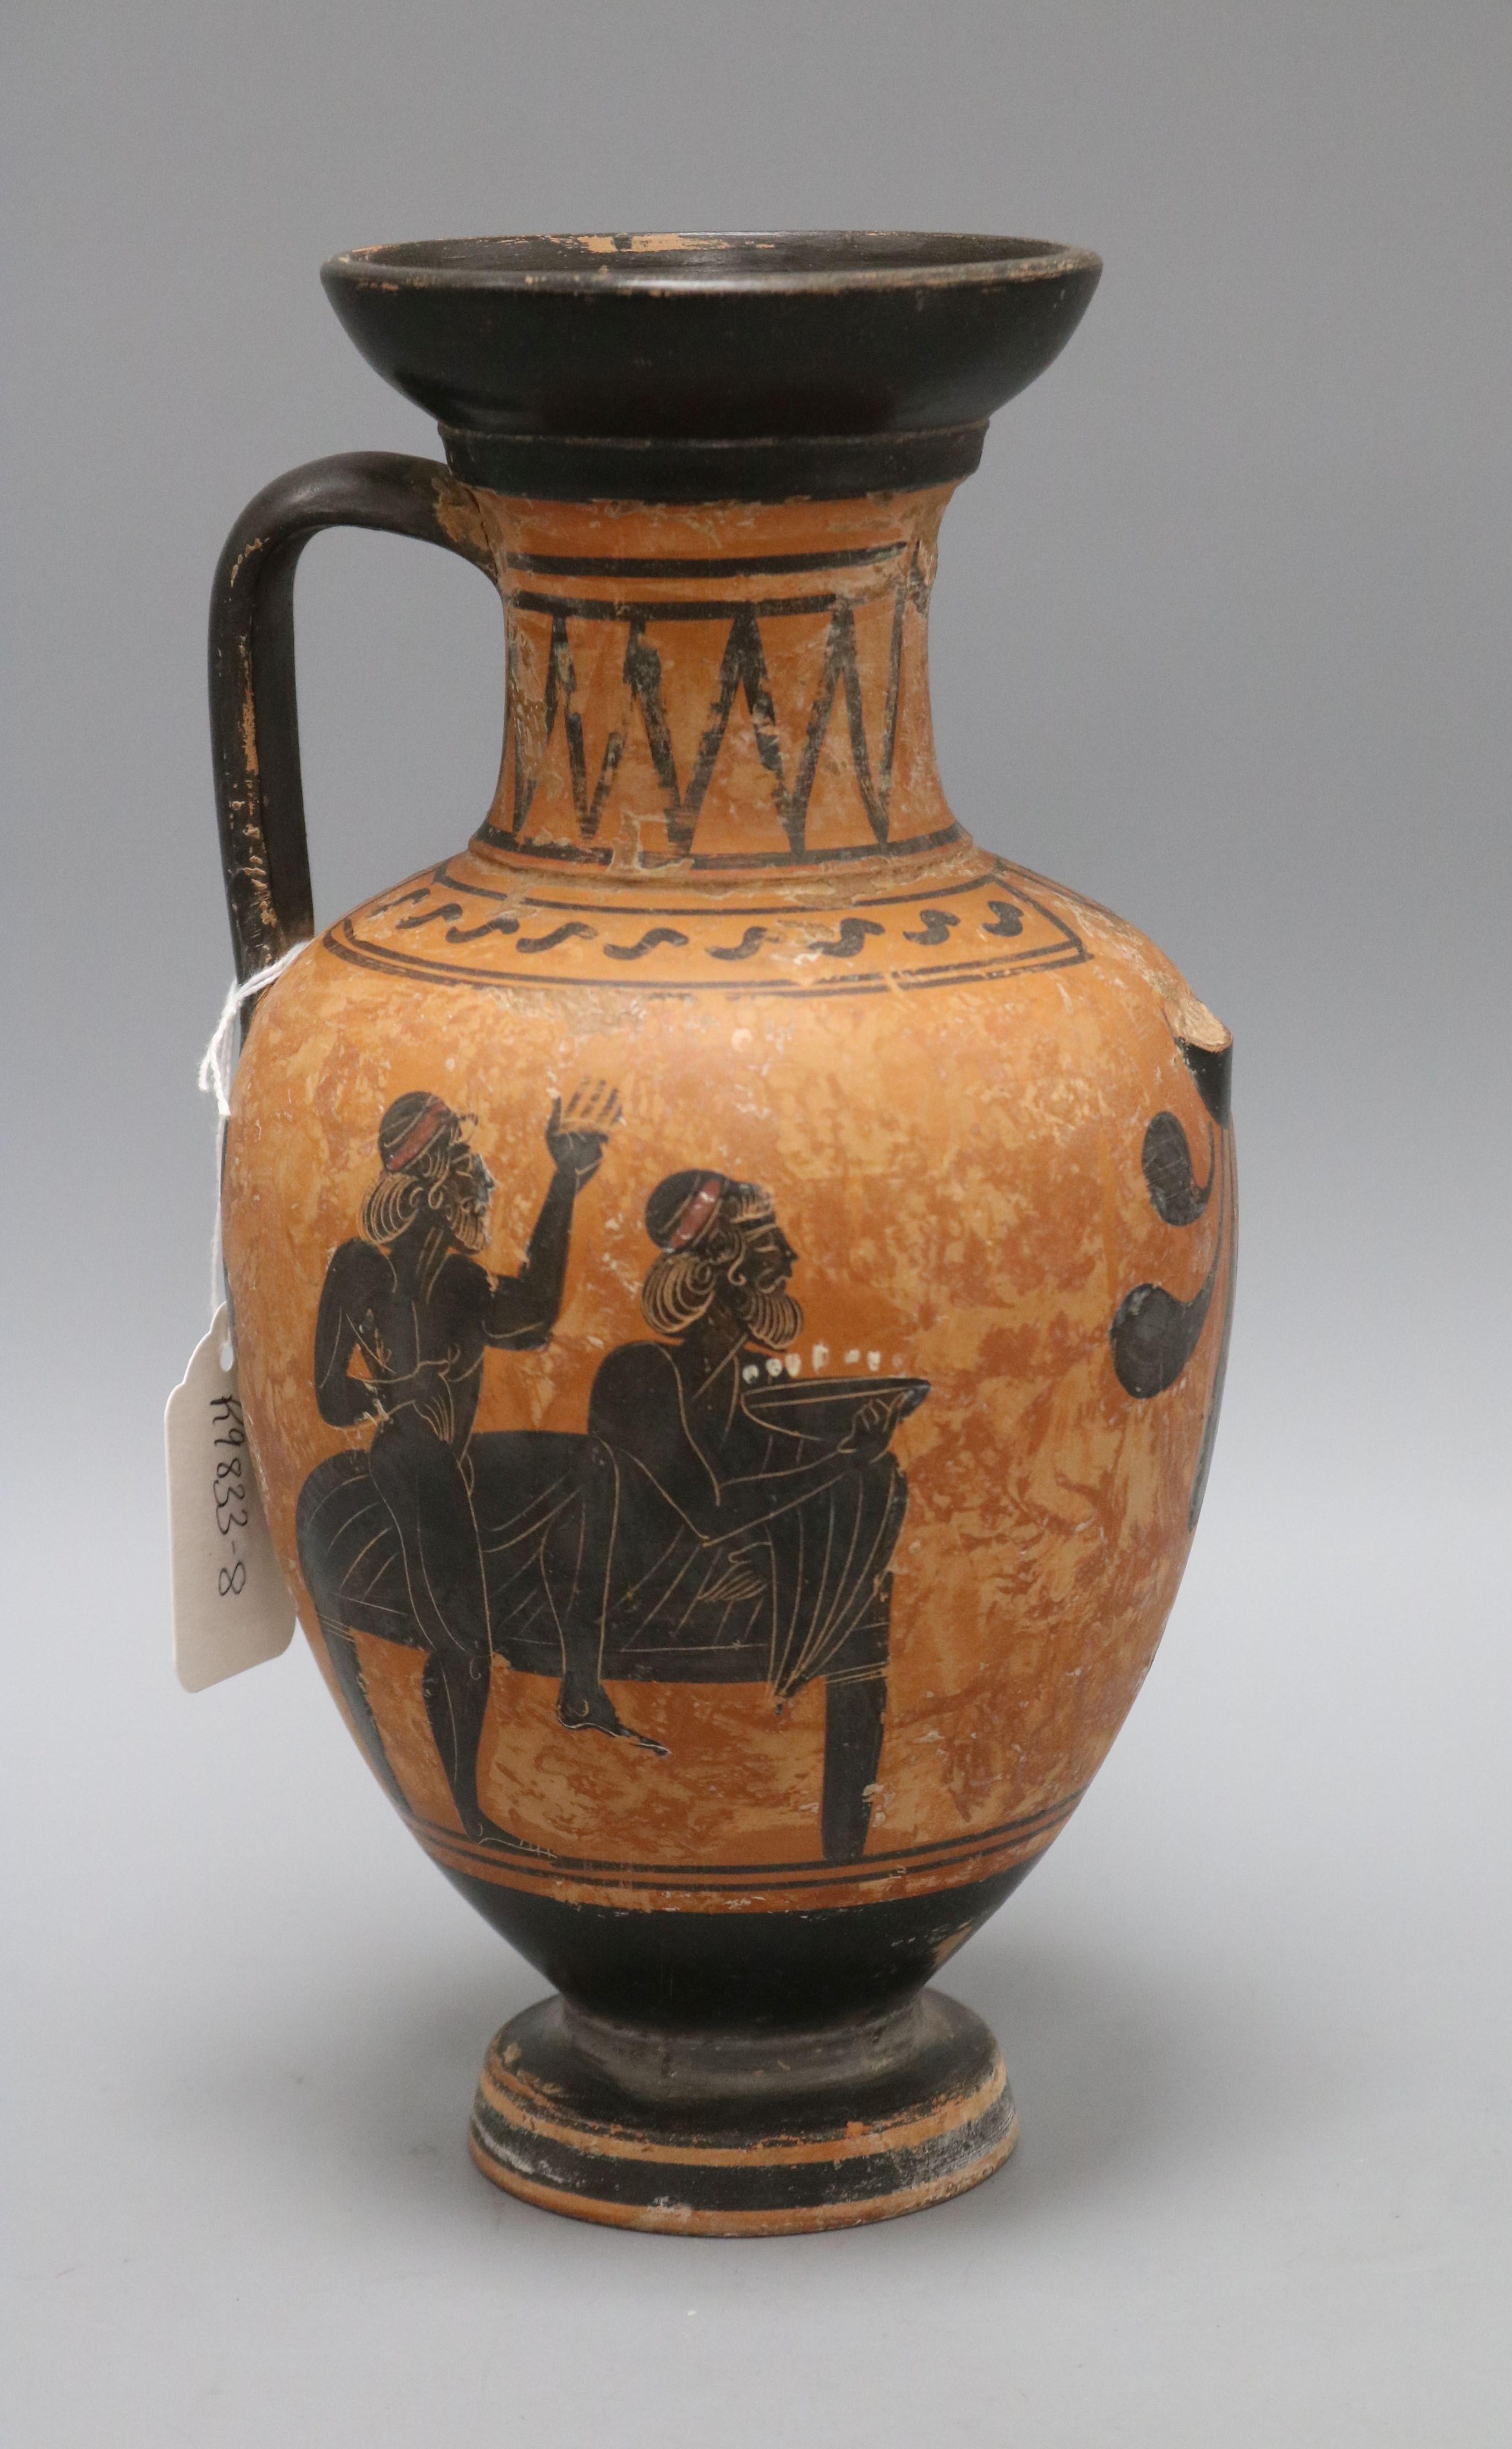 Lot 33 - A Greek Attic style vessel height 28cm (a.f.)